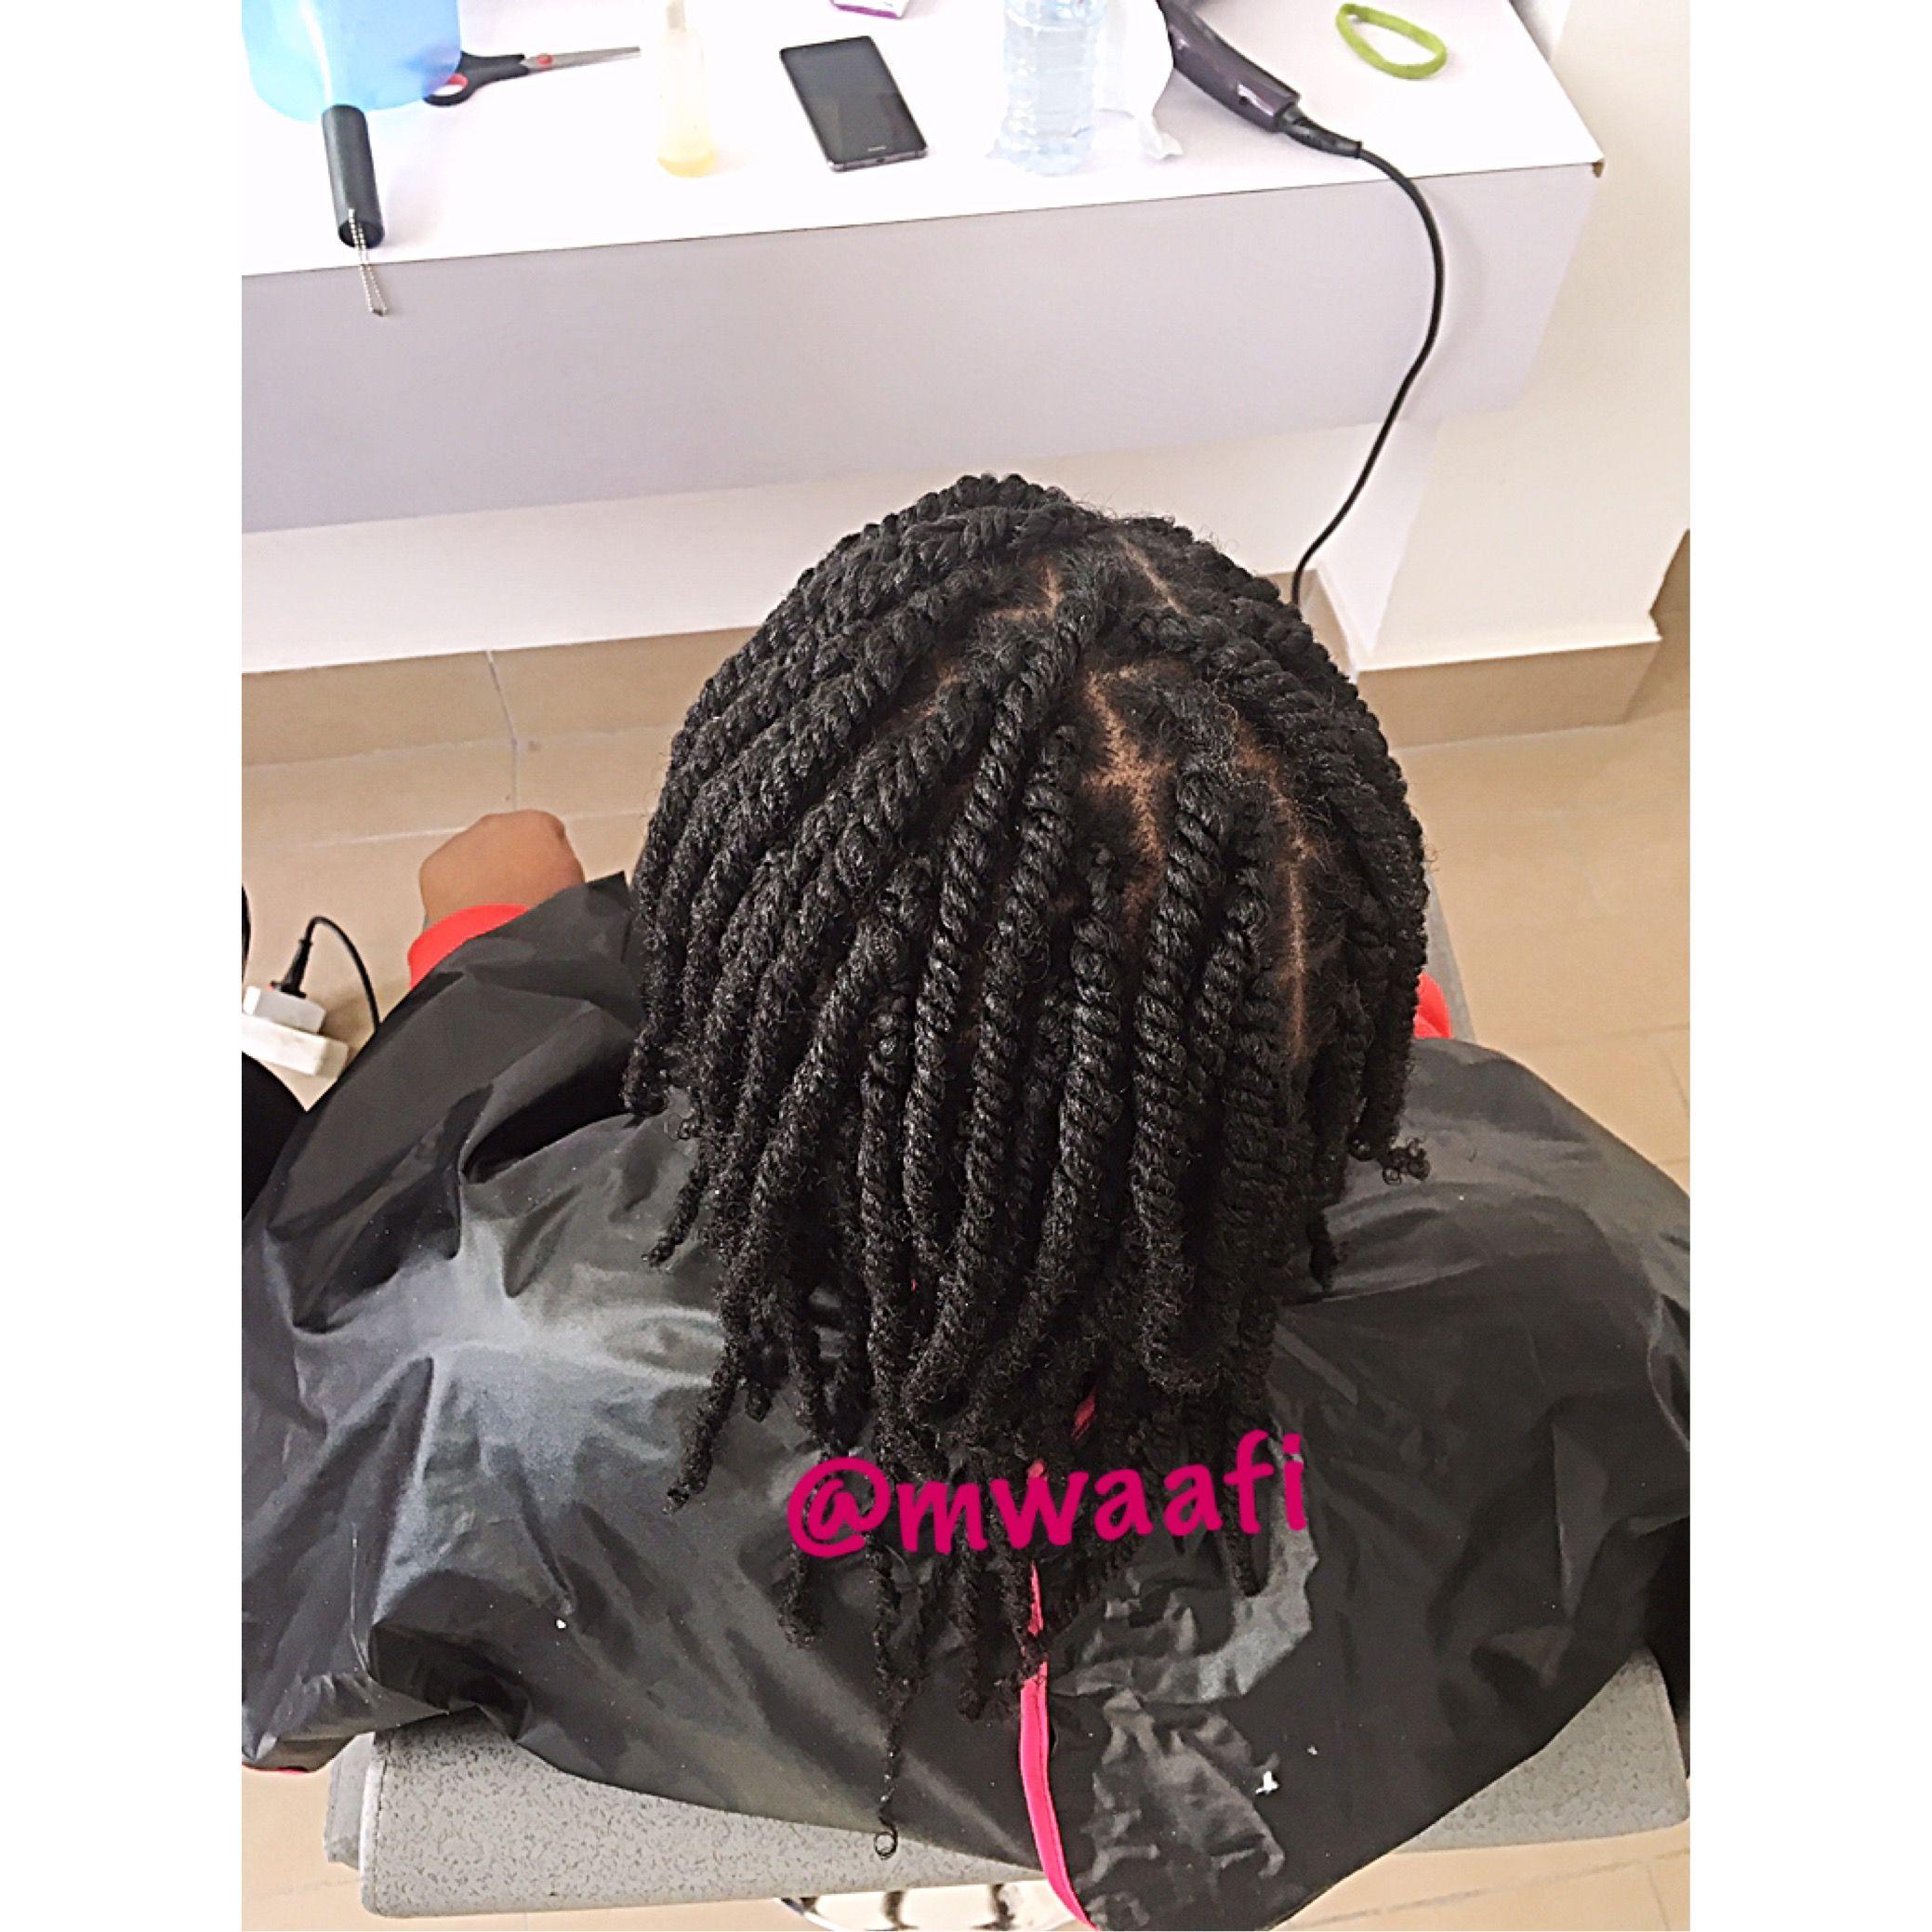 Salon Mwaafi Pointe Noire Congo Twists Vanilles Protectivestyles Naturalhairstyles Braids Hair Styles Dreadlocks Beauty